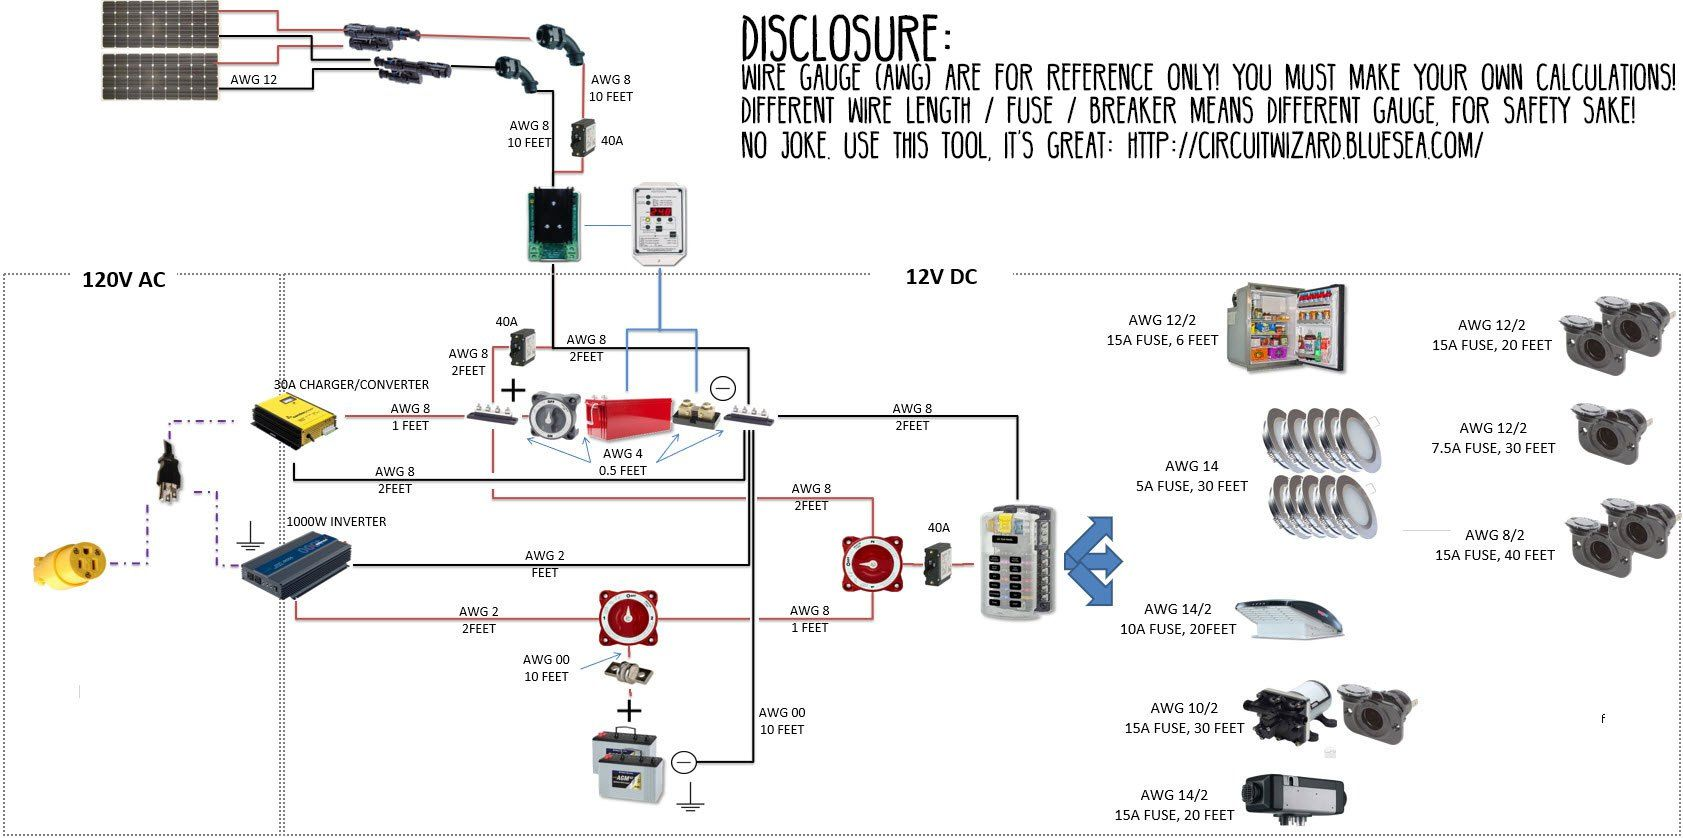 hight resolution of electrical diagram logical ford transit camper van v3 with disclosure